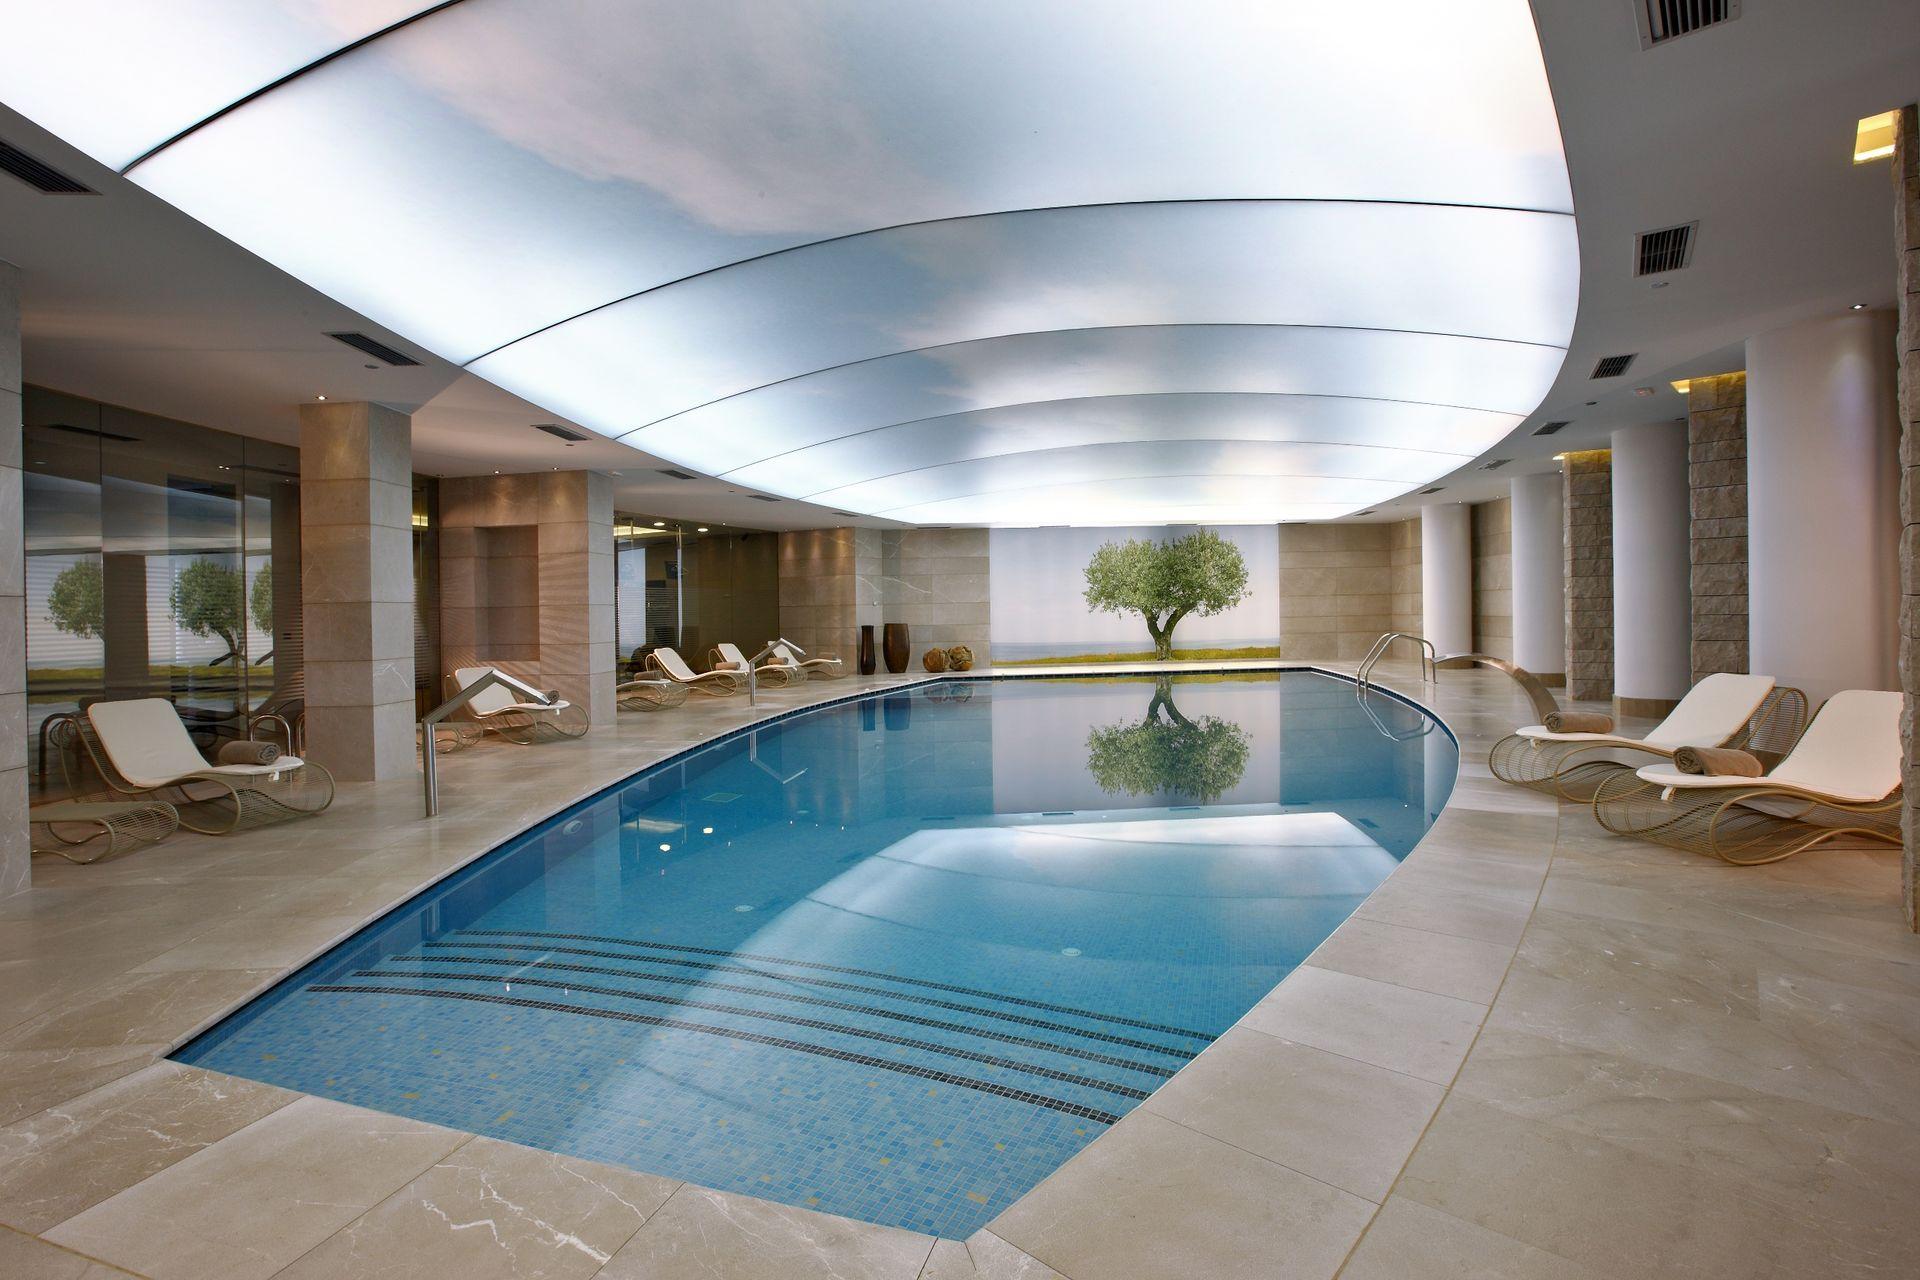 Cavo Olympo Luxury Hotel & Spa - Adult Only, Πλάκα Λιτόχωρου, Πιερία